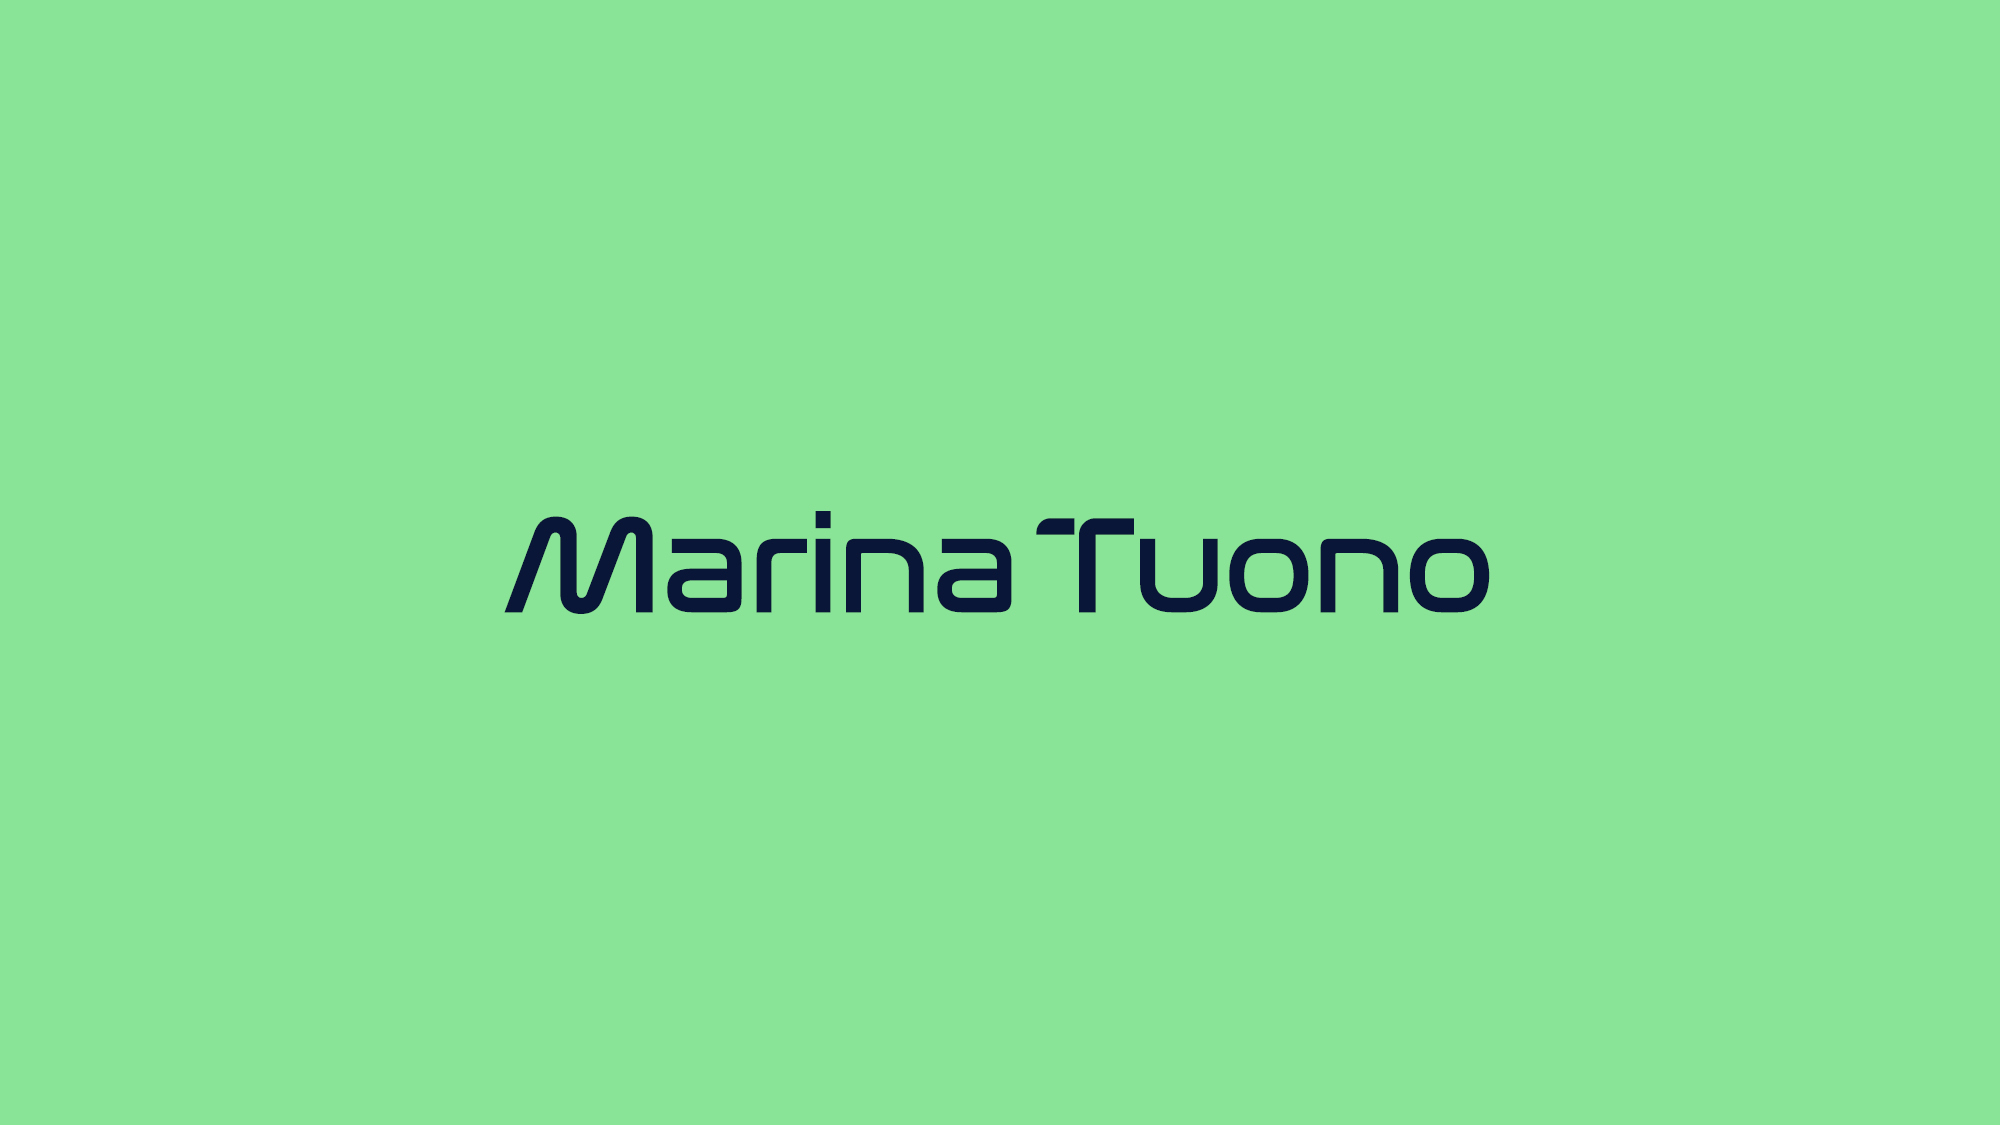 NacioneBranding_MarinaTuono_Monobob3